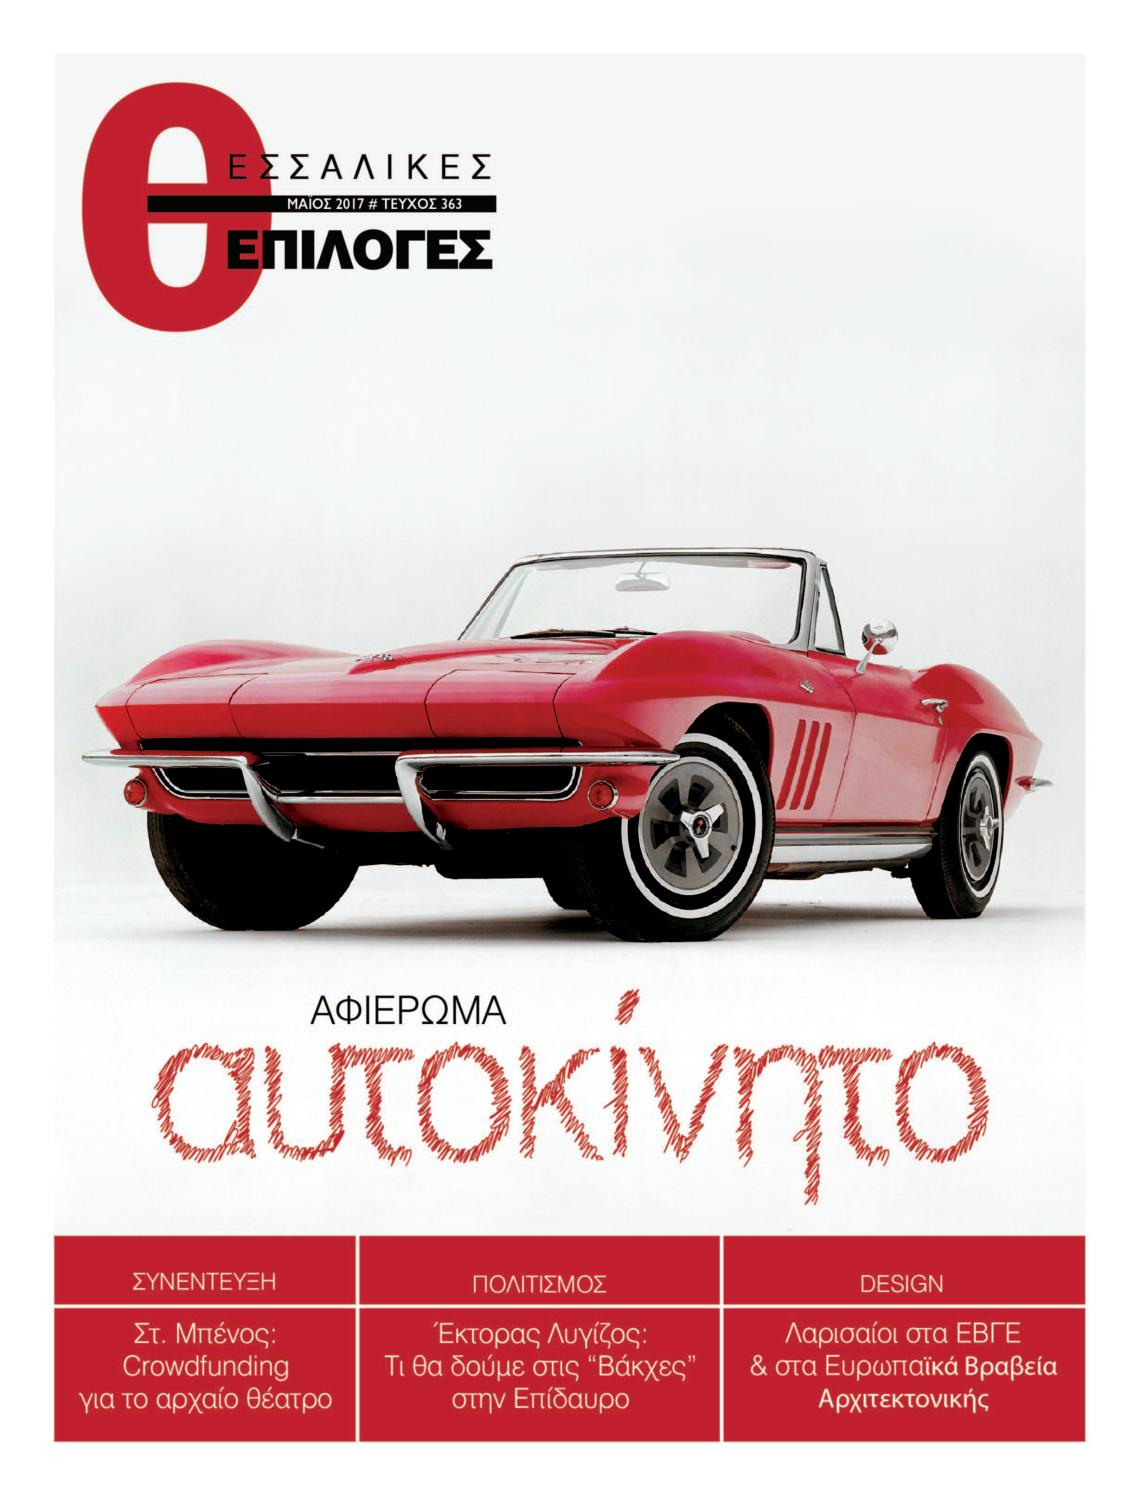 e56f3afab6b Θεσσαλικές Επιλογές Μάιος 2017   Τεύχος Αυτοκίνητο by Θεσσαλικές Επιλογές -  issuu